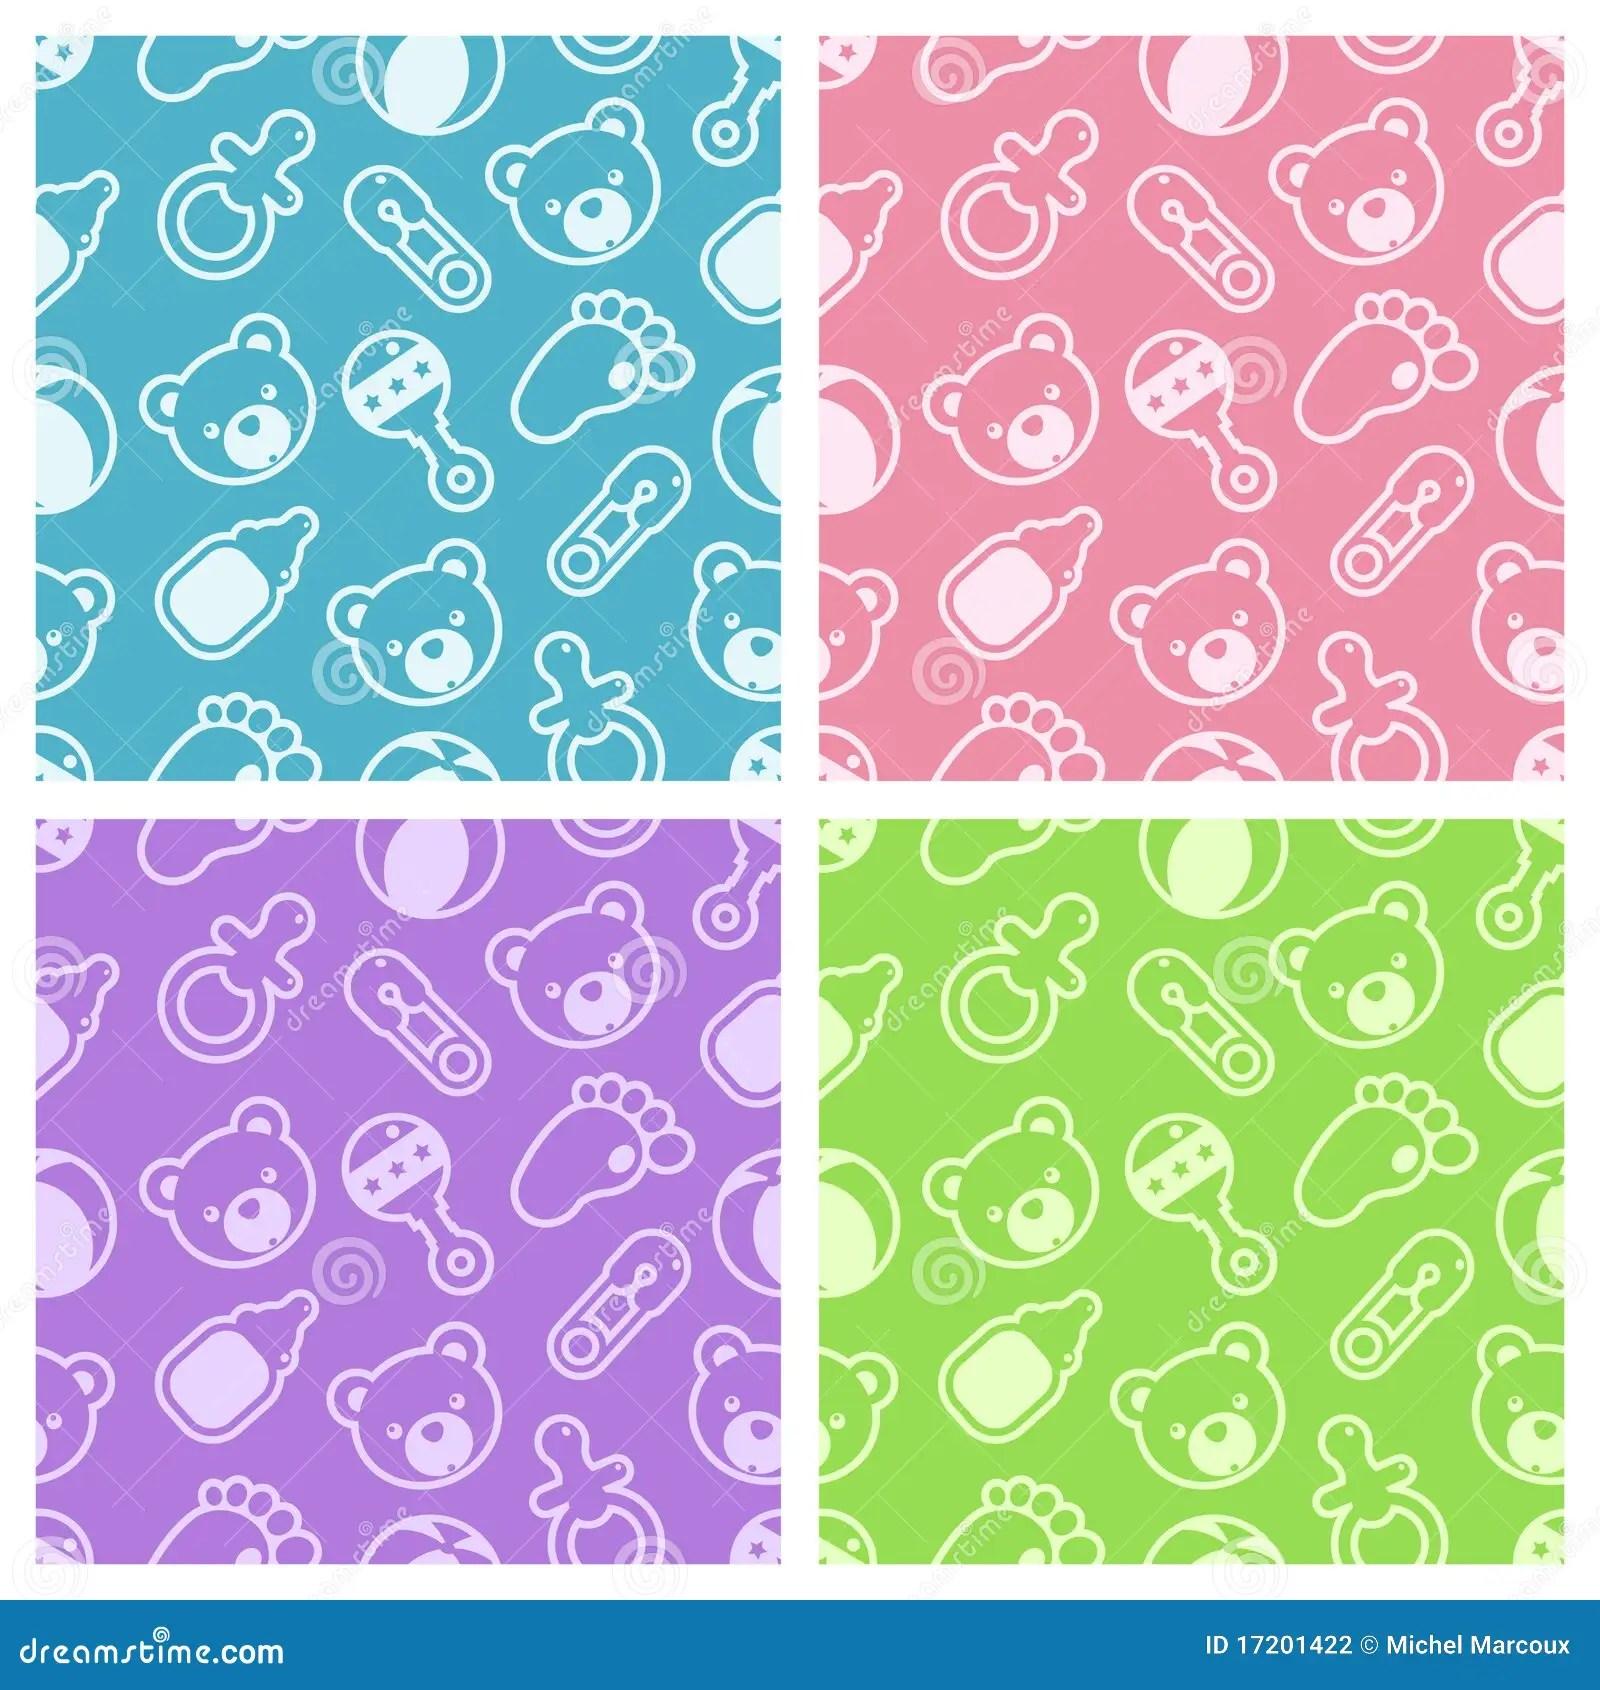 Girl Baby Shower Wallpaper Baby Shower Seamless Patterns Stock Vector Image 17201422